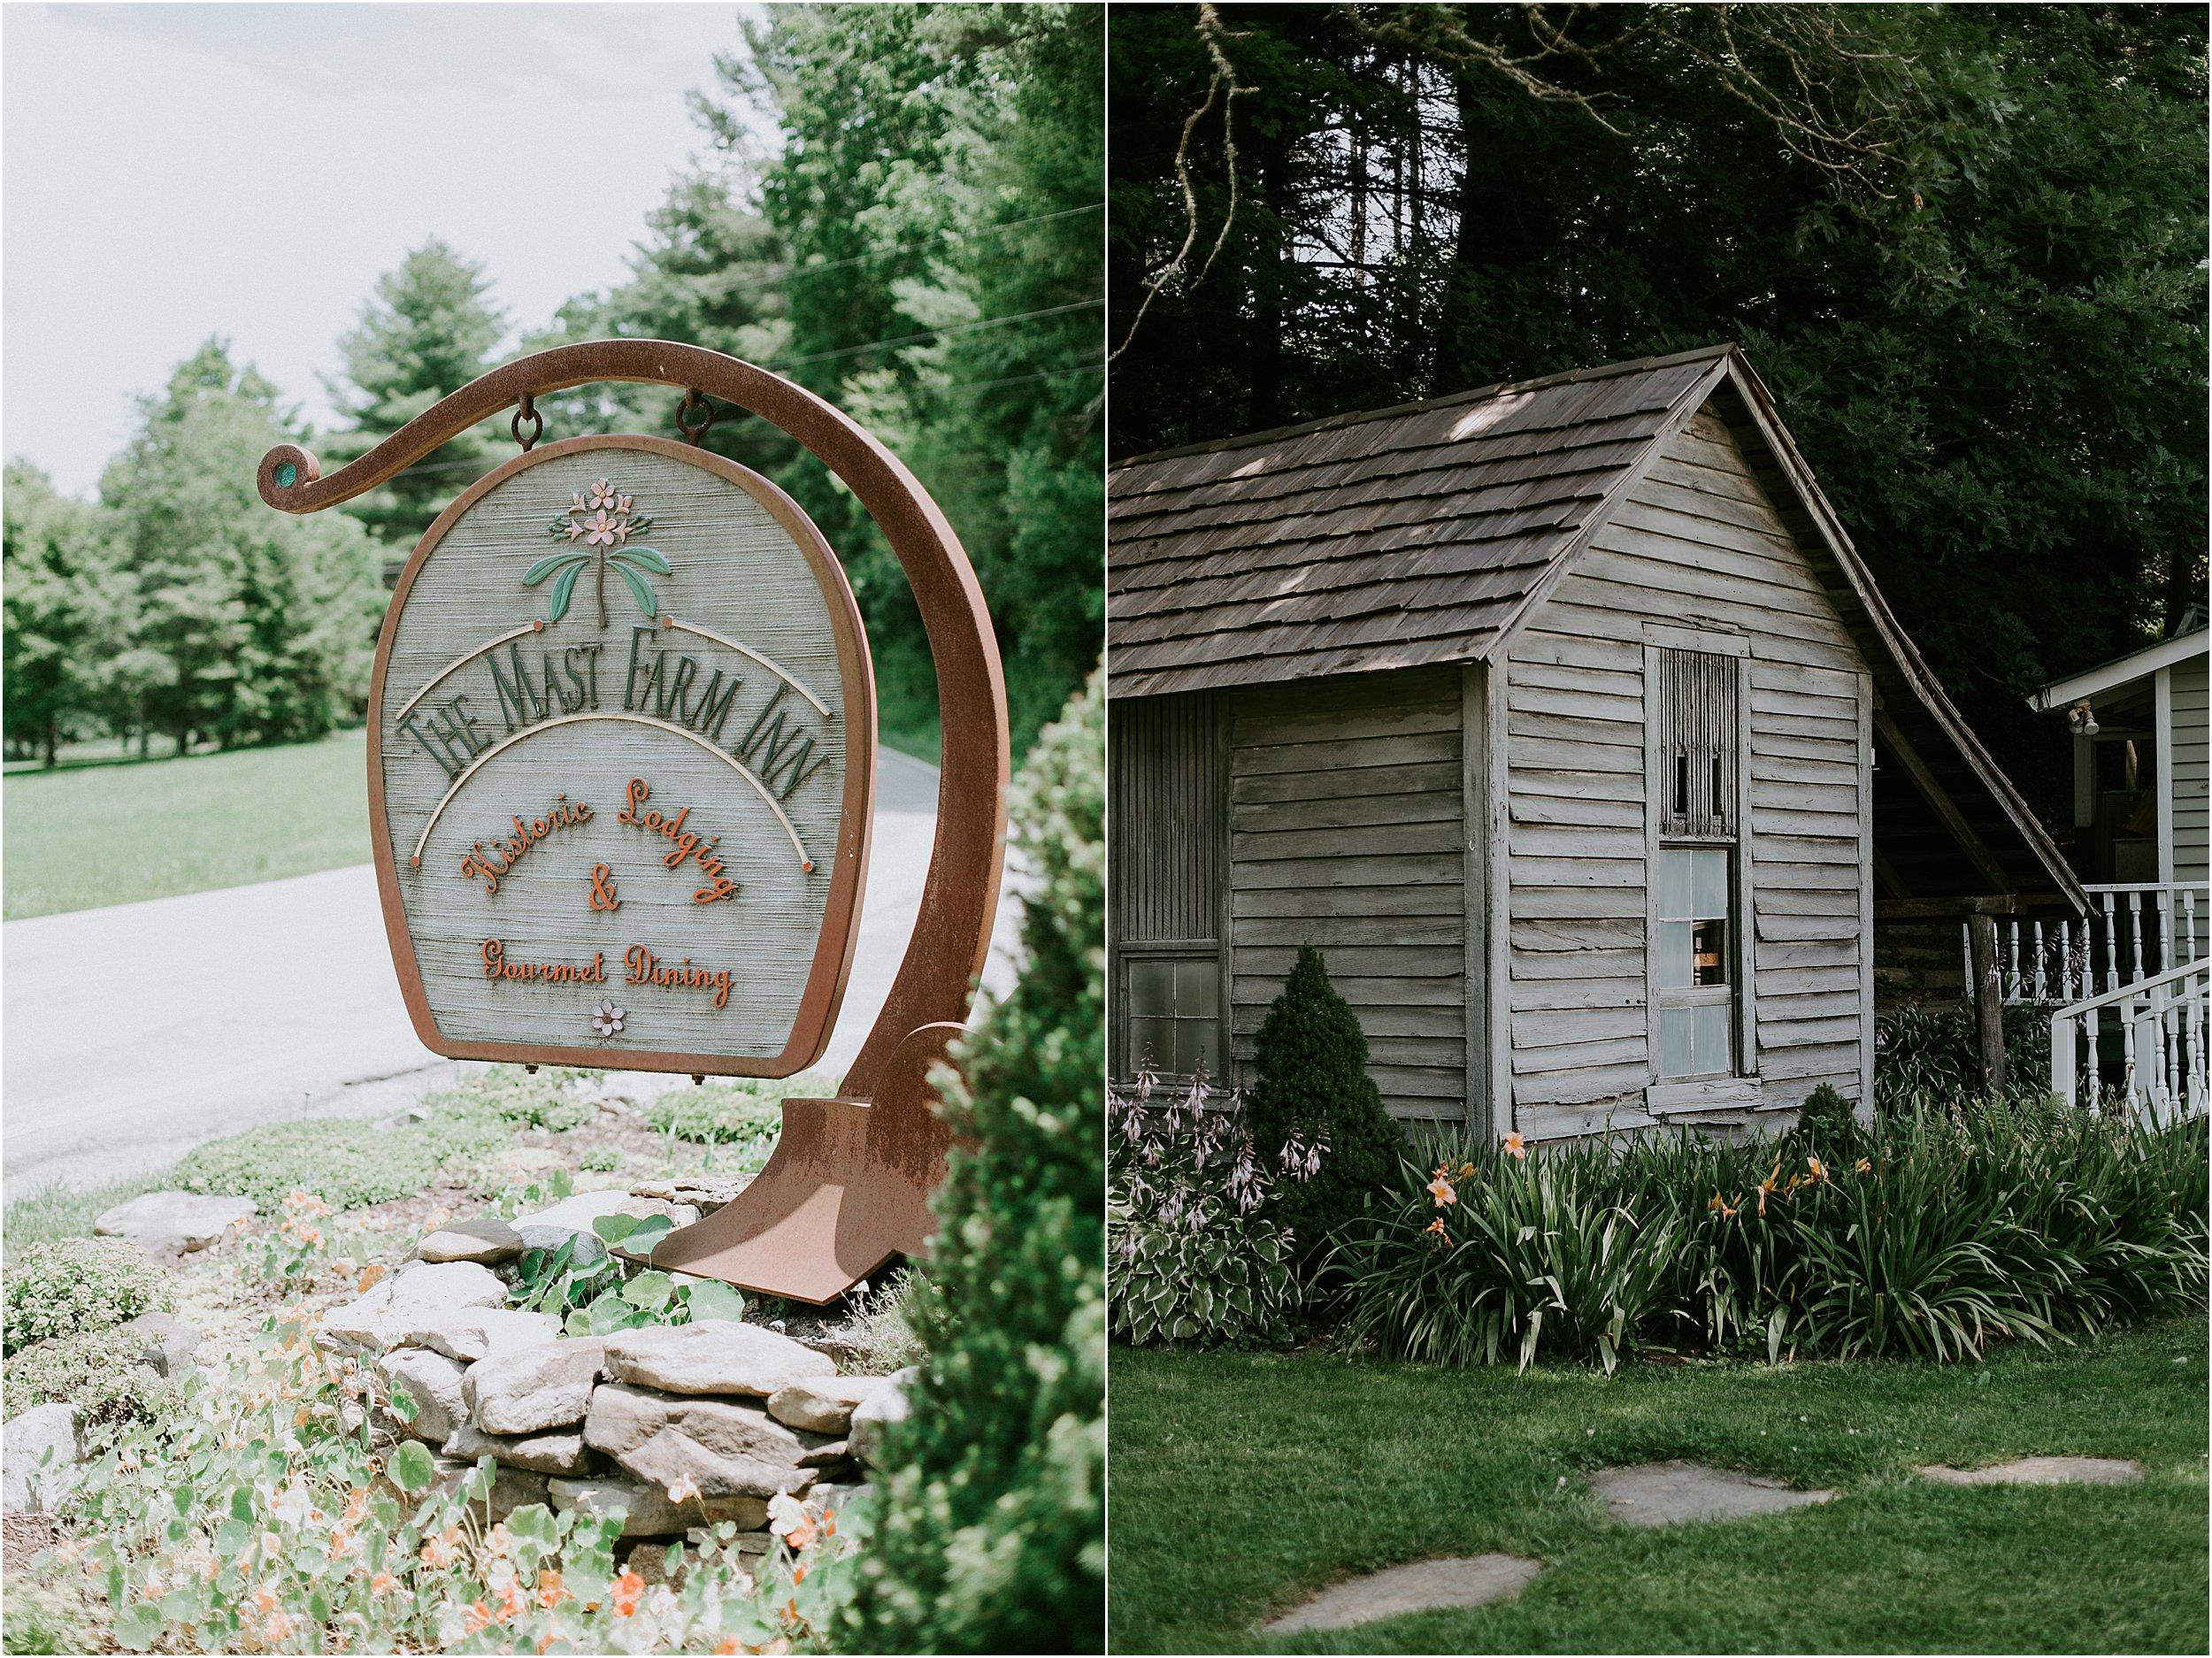 Mast-Farm-Inn-Mountain-Wedding_0001.jpg